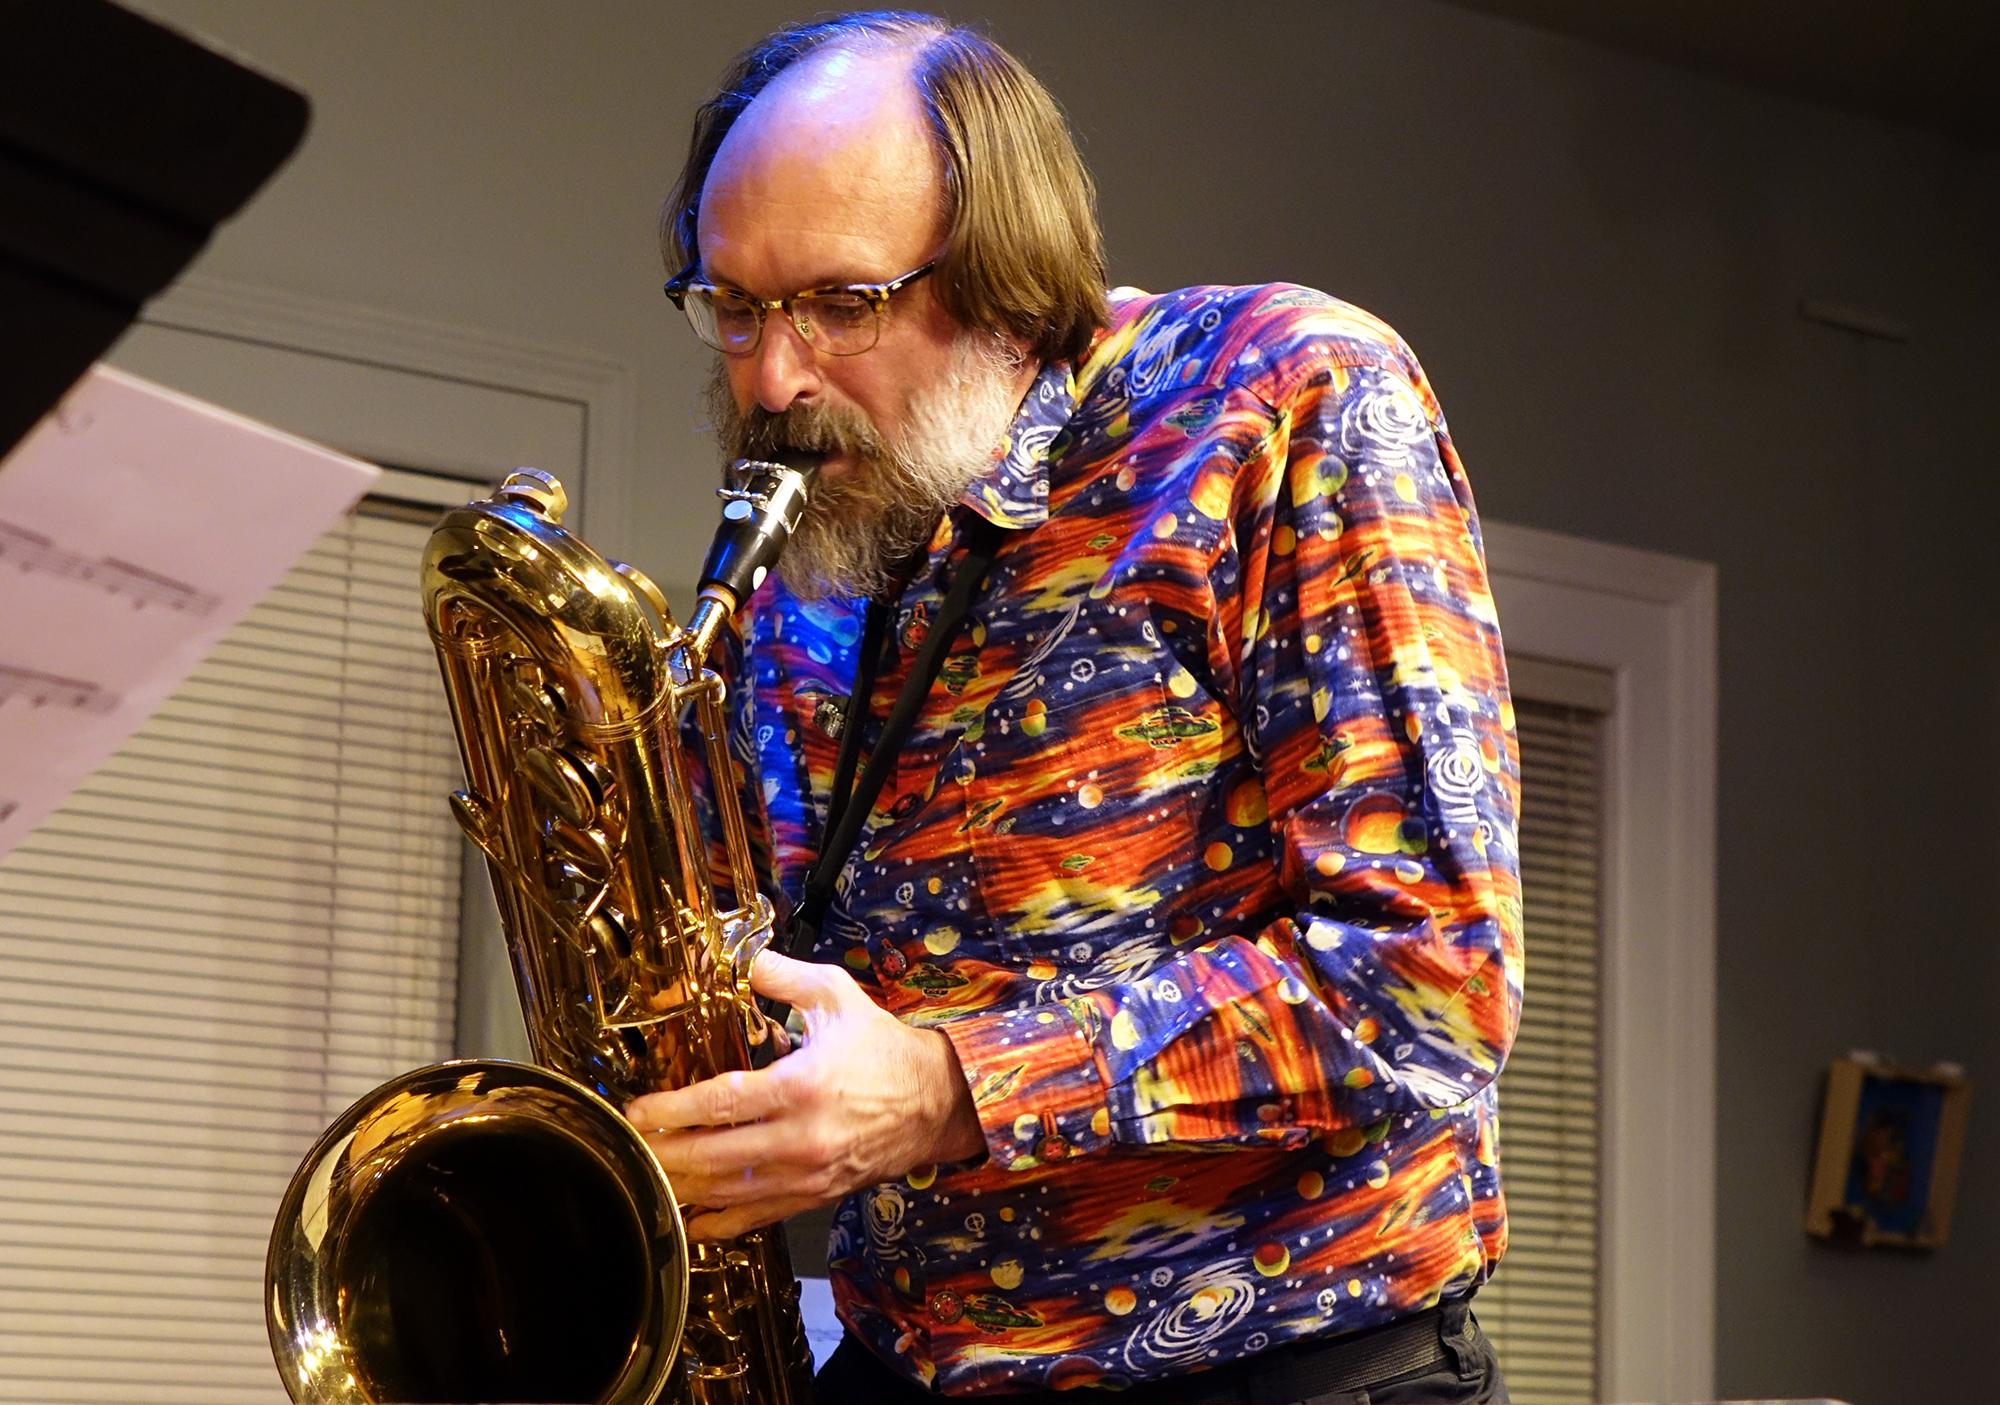 Scott Robinson at Edgefest 2017